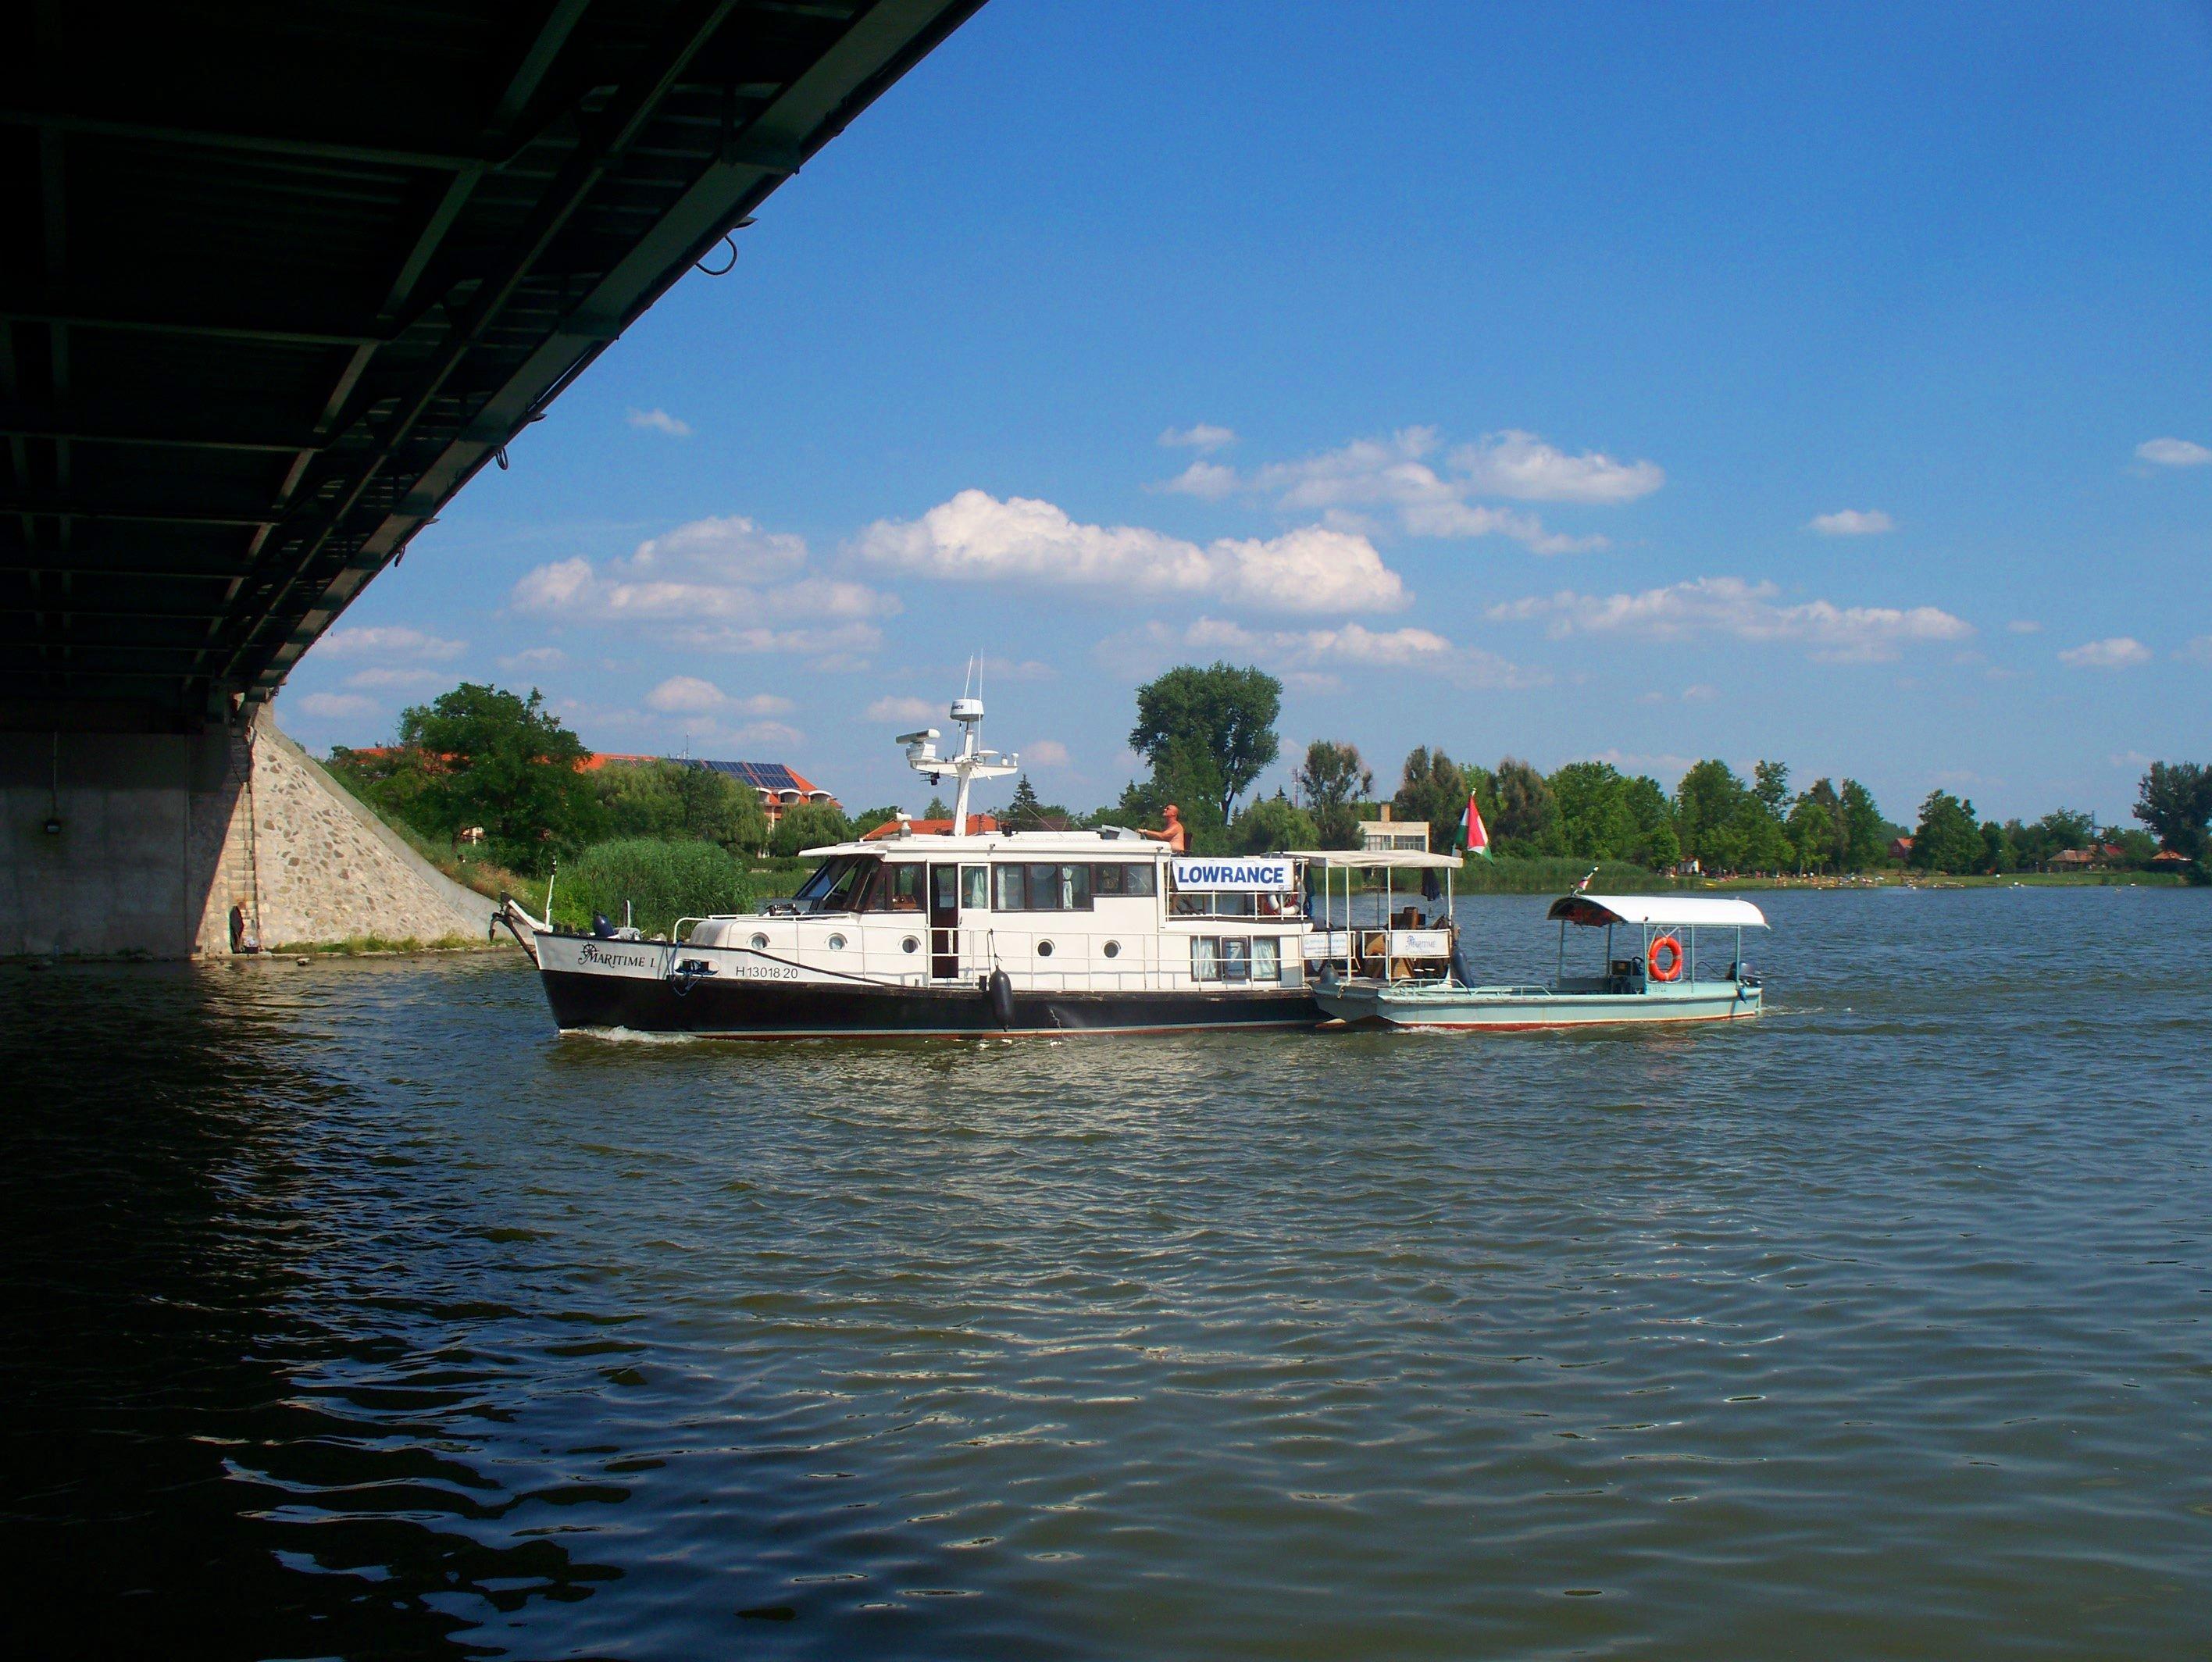 http://www.kisdunainagyhajok.hu/egyebhajok/2012_06_24_maritime_motoros_vontatohajo_a_rackevei-hidnal/2012_06_24_maritime_motoros_vontatohajo_a_rackevei-hidnal_006.jpg